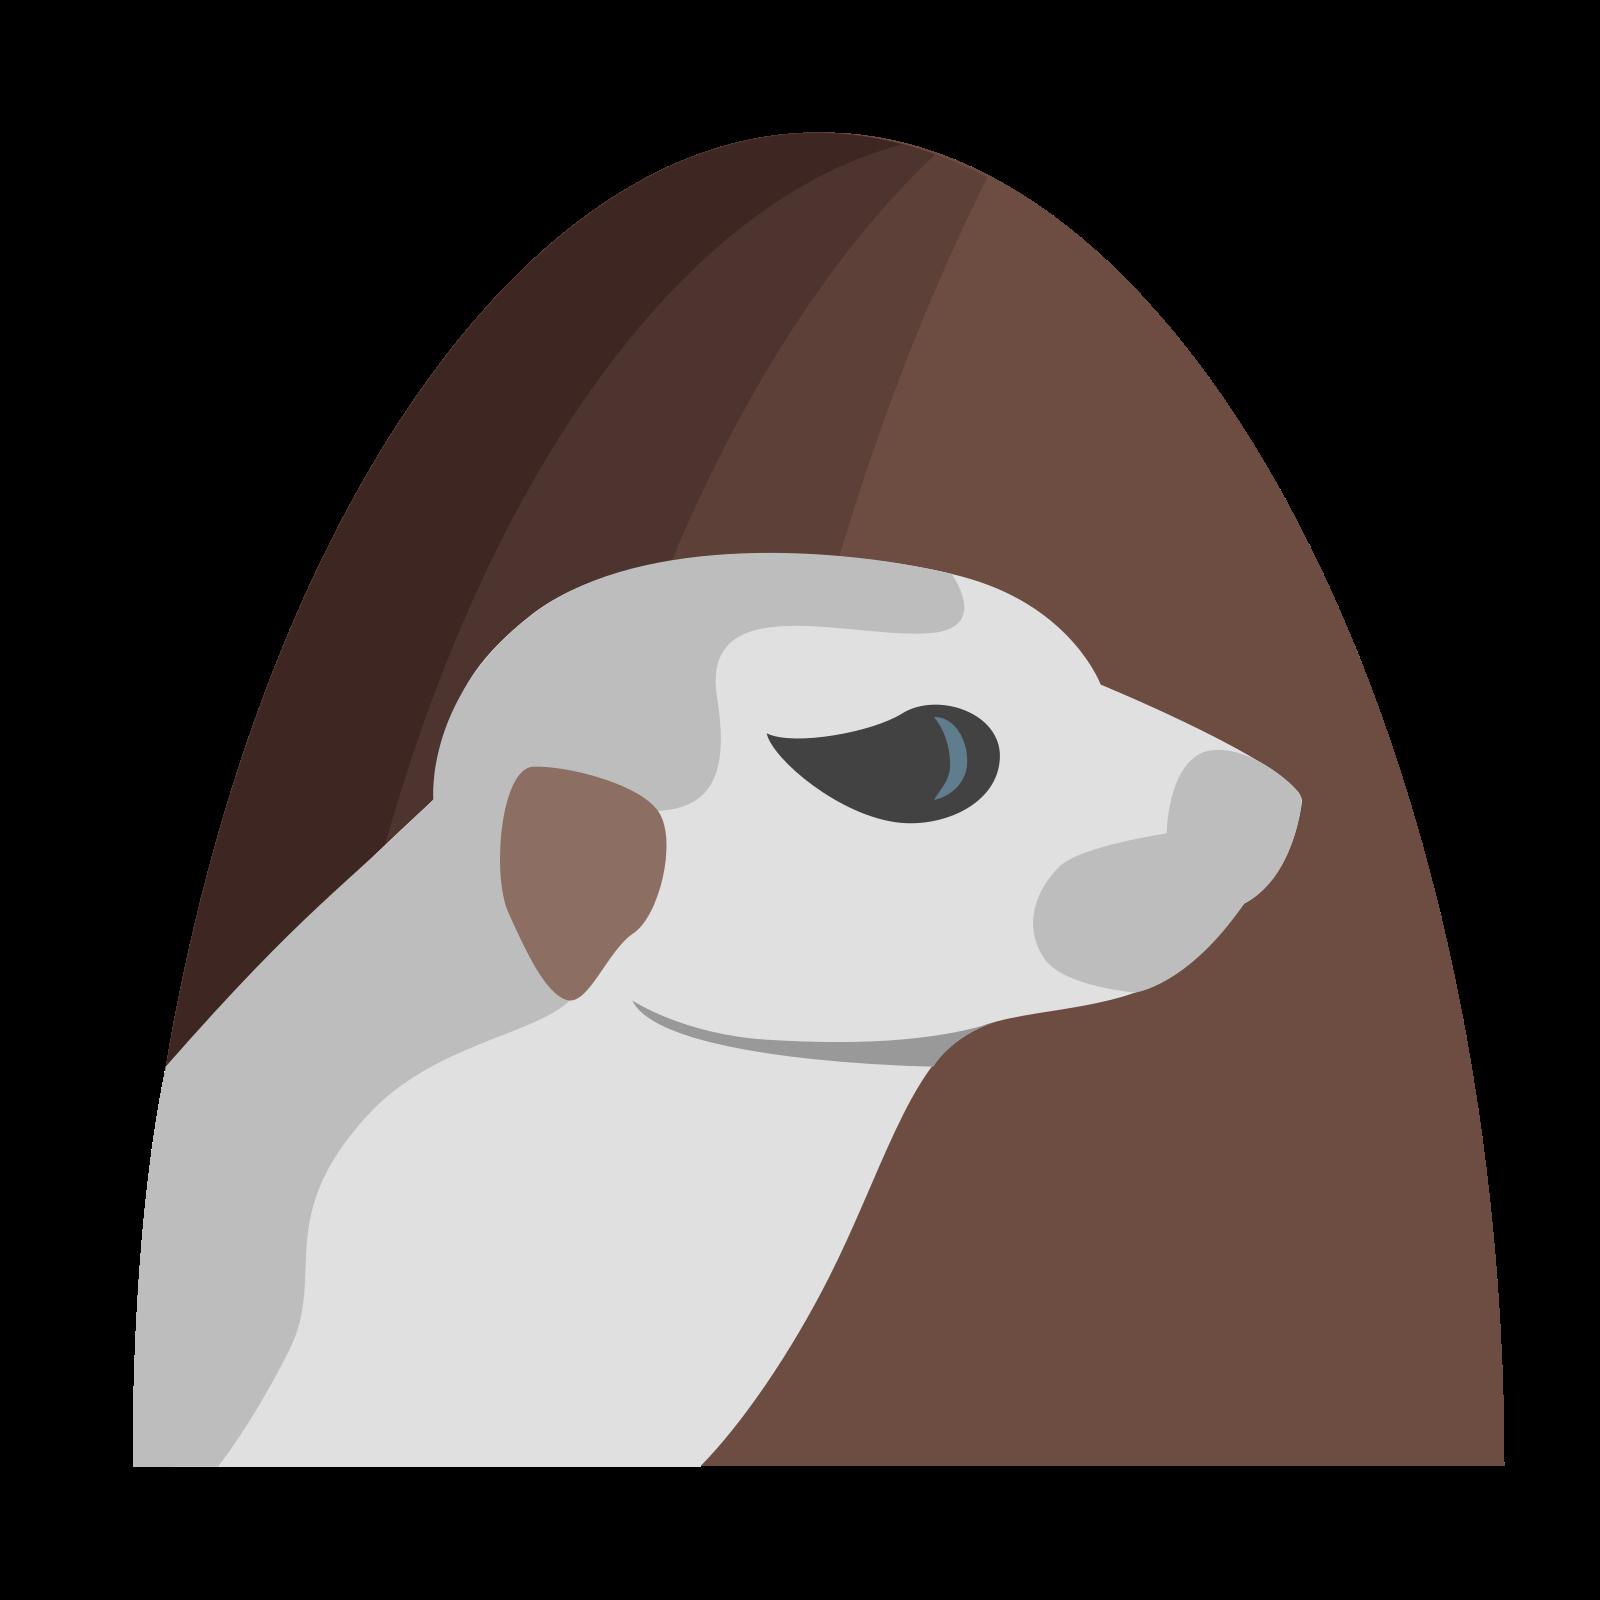 Suricate Lunette icon